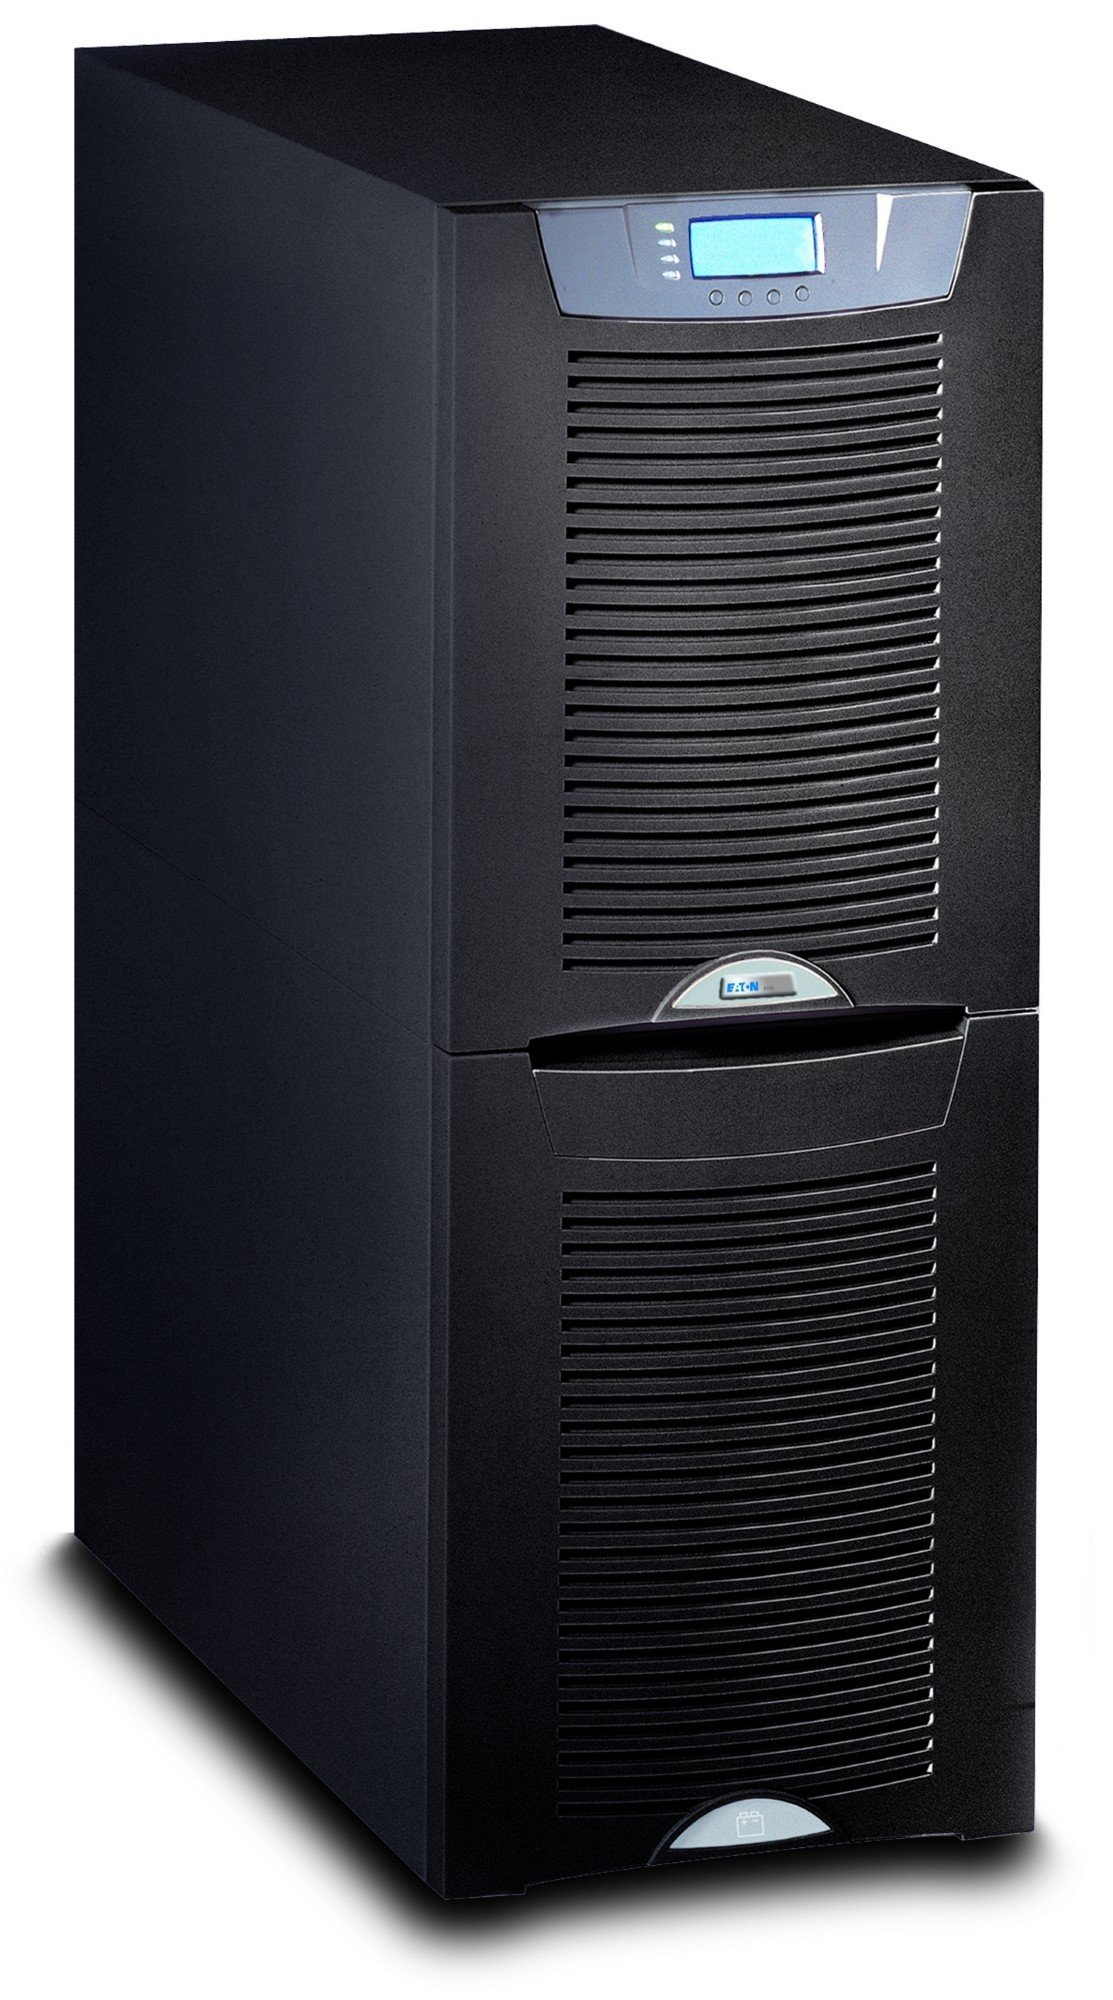 An image of Eaton powerware 9155-15-nlhs-10-64x7ah uninterruptible power supply (ups) 15000 ...